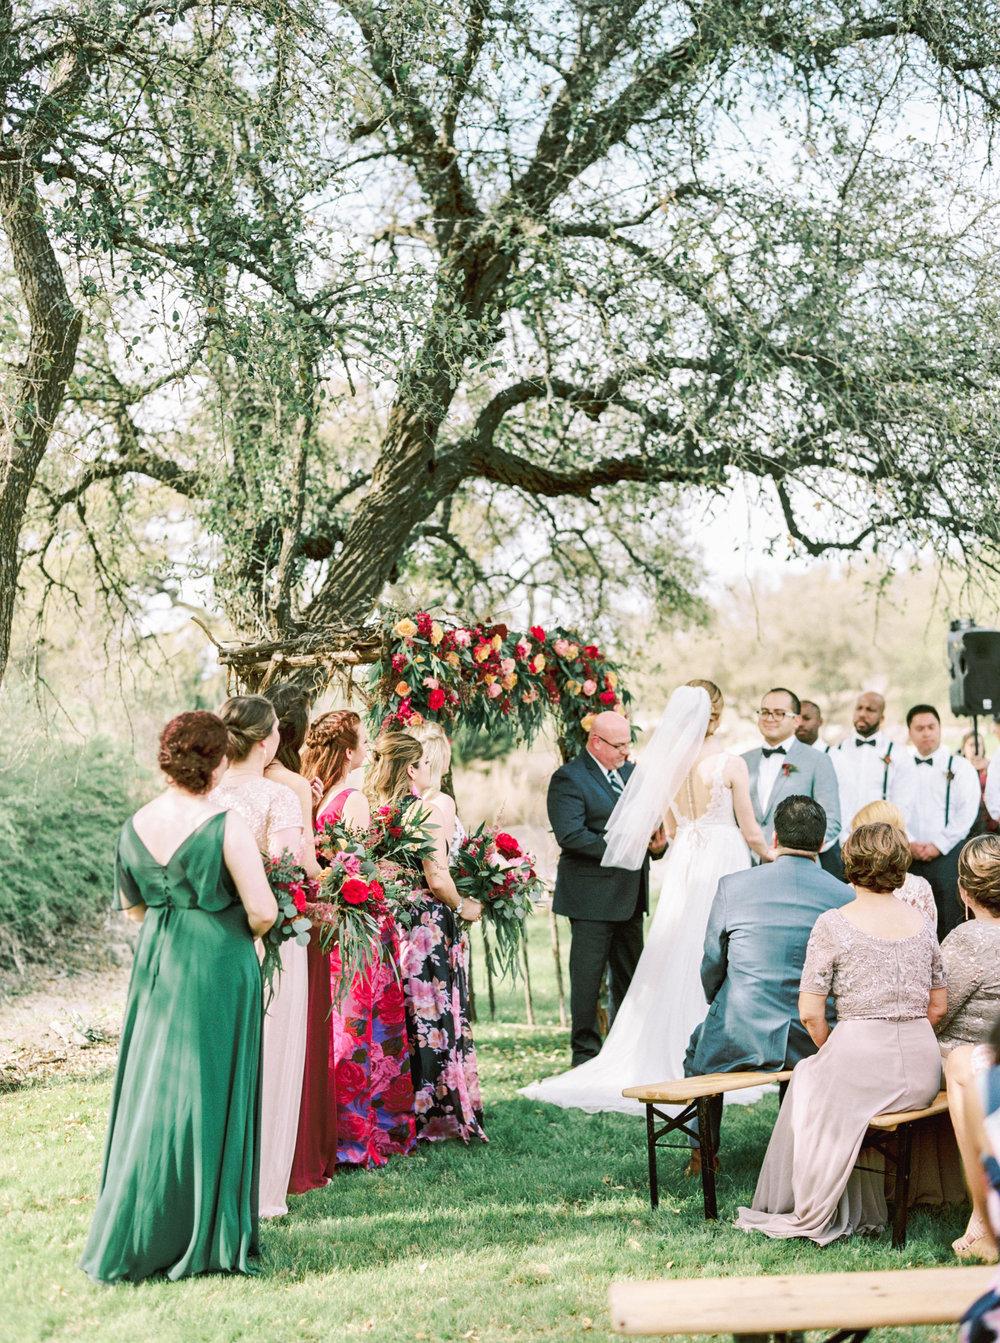 the-creek-haus-wedding-venue-austin-texas-wedding-destination-venue-with-lodging-style-me-pretty-bridesmaids-mix-match-dresses